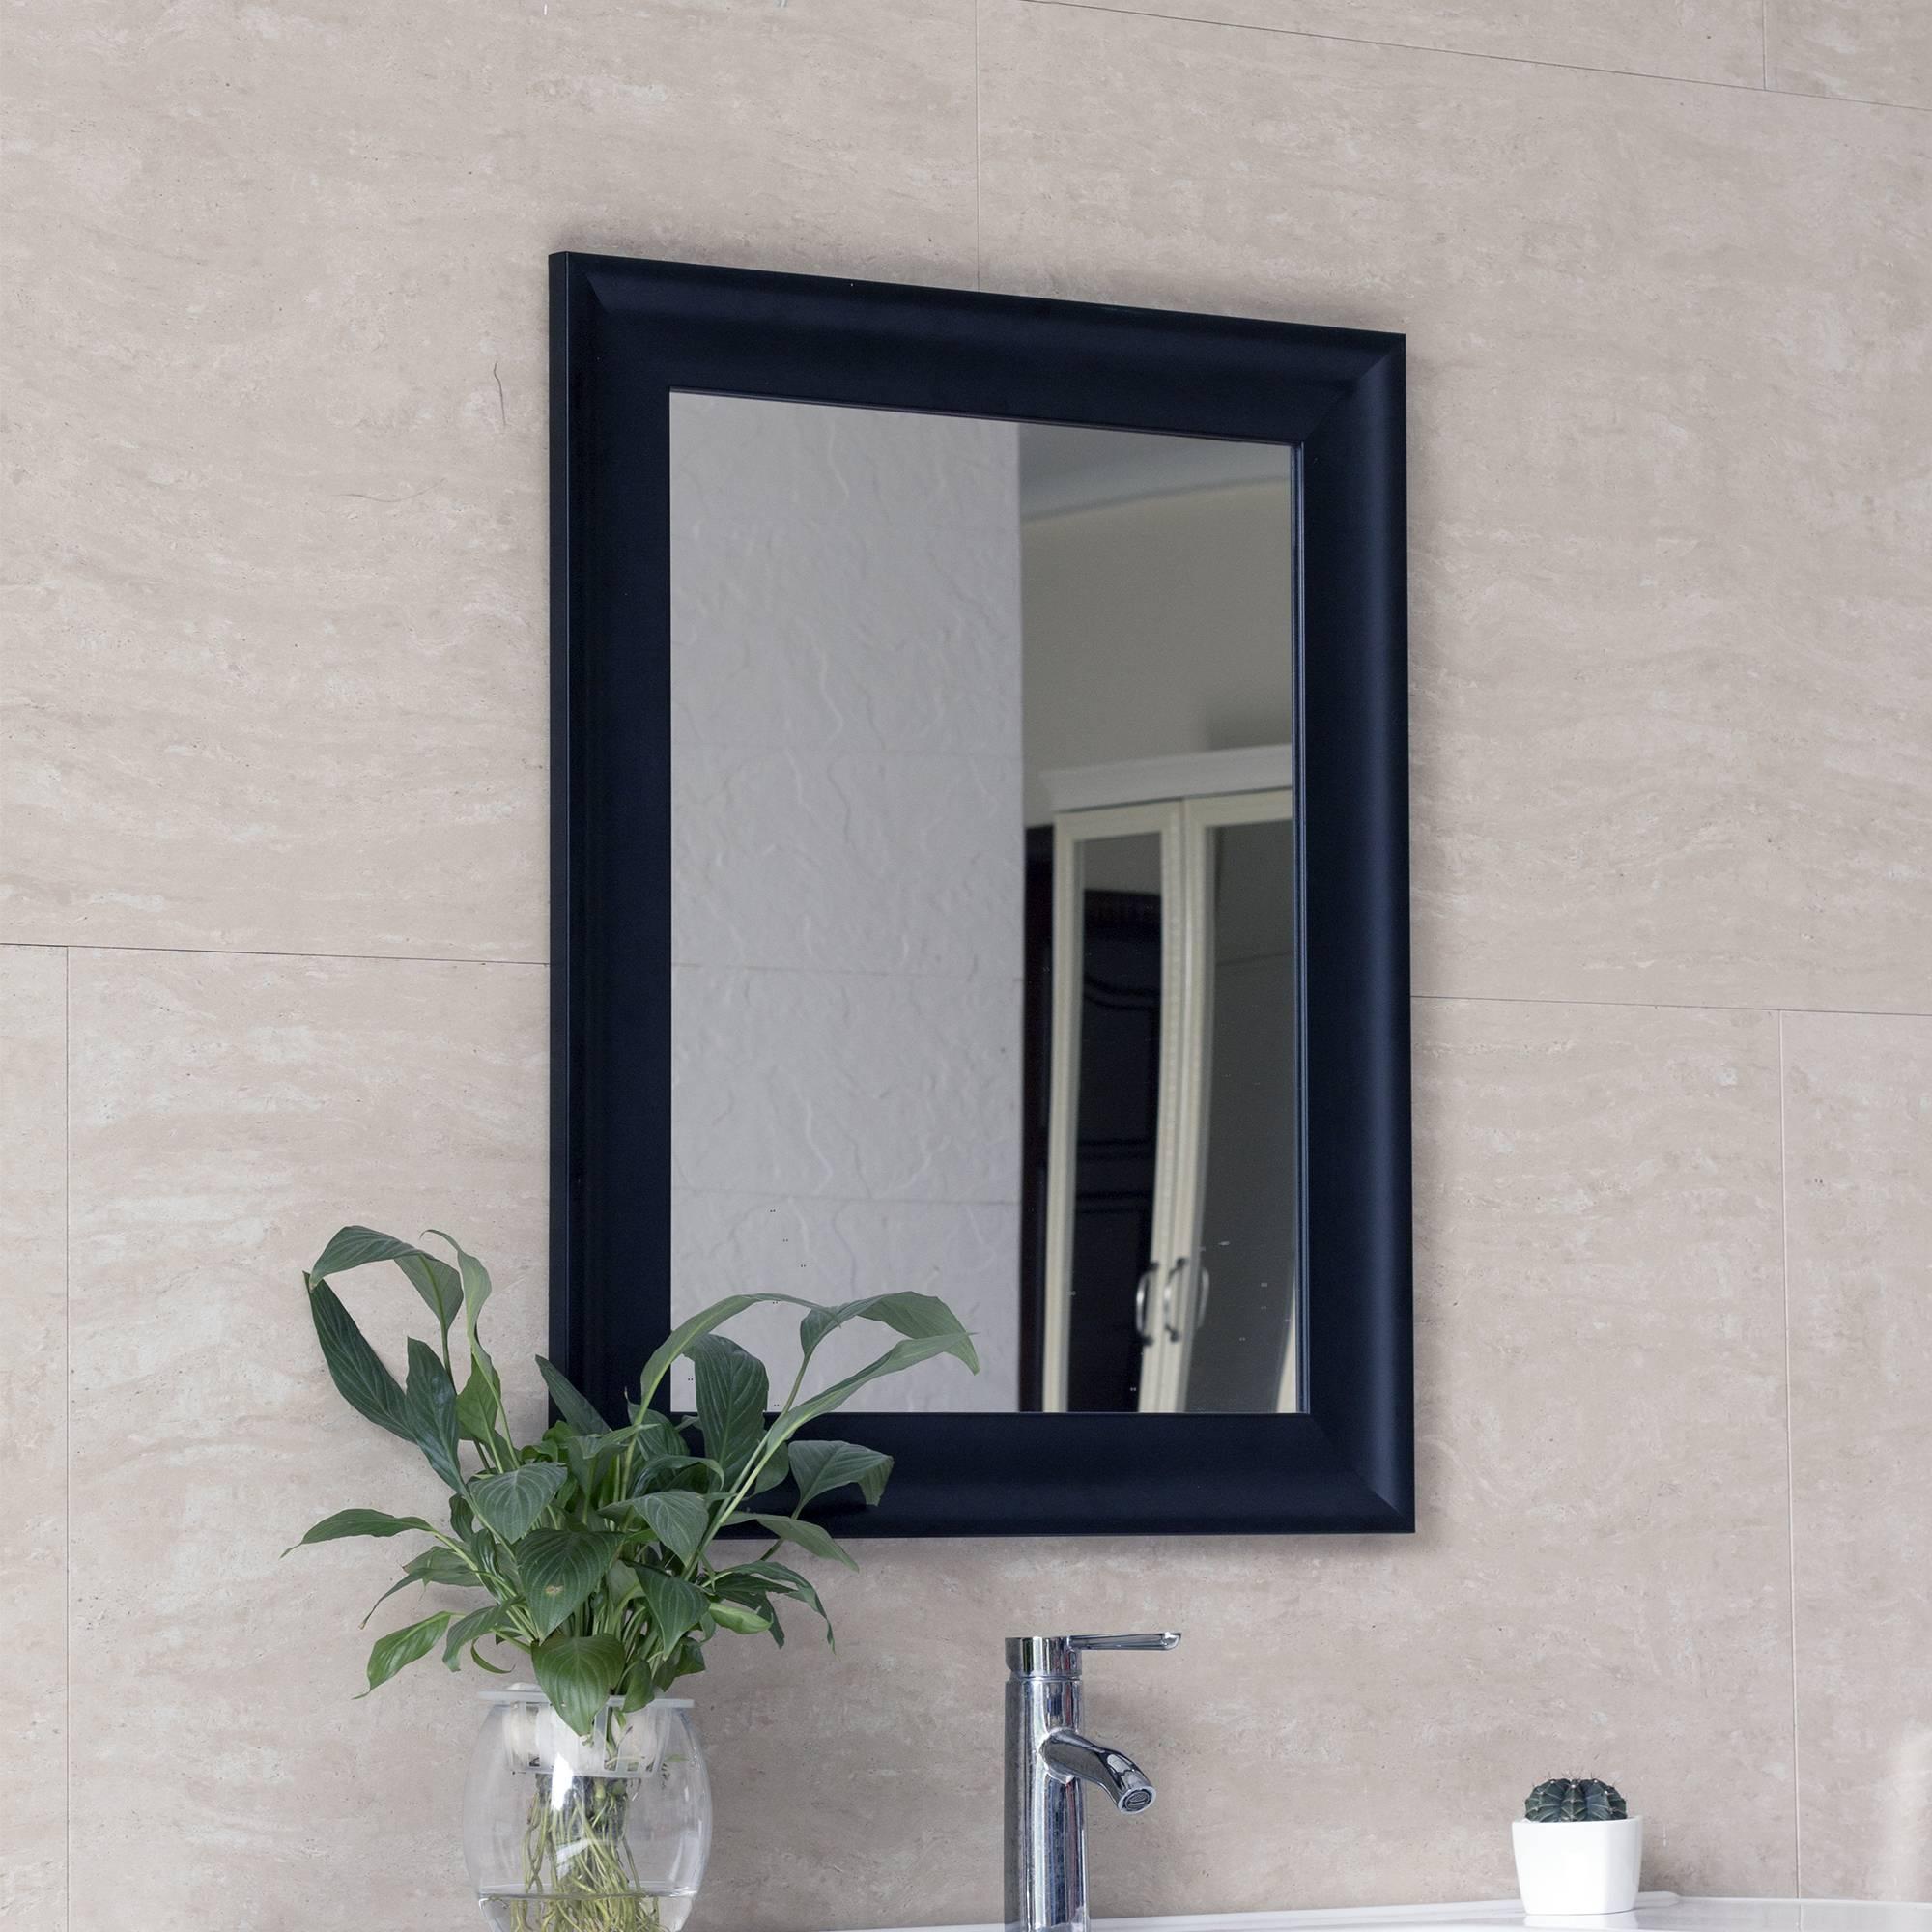 Black Modern Wall Mirror 1824 3